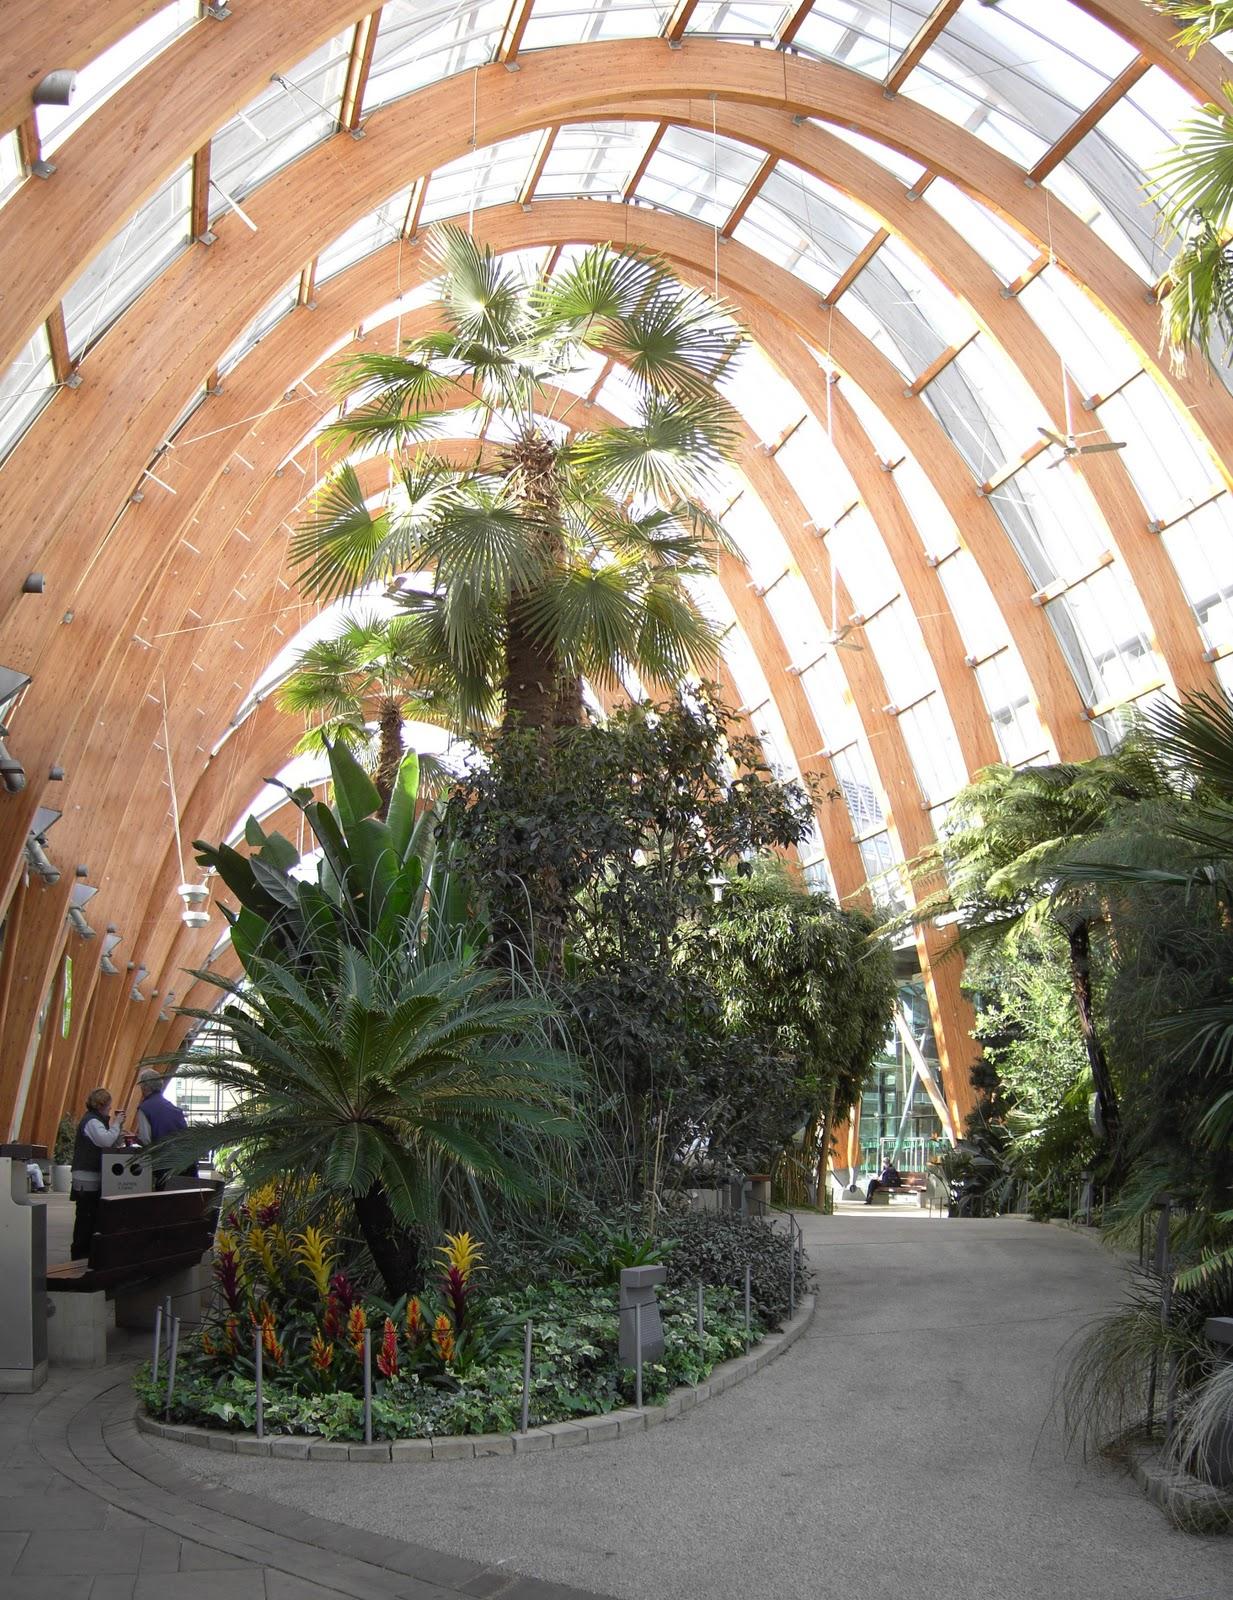 http://3.bp.blogspot.com/_JYdx4QpM8_Q/TKuH4dL1QtI/AAAAAAAAAbM/Suwj-BuOTbY/s1600/Sheffield_Winter_Garden.jpg